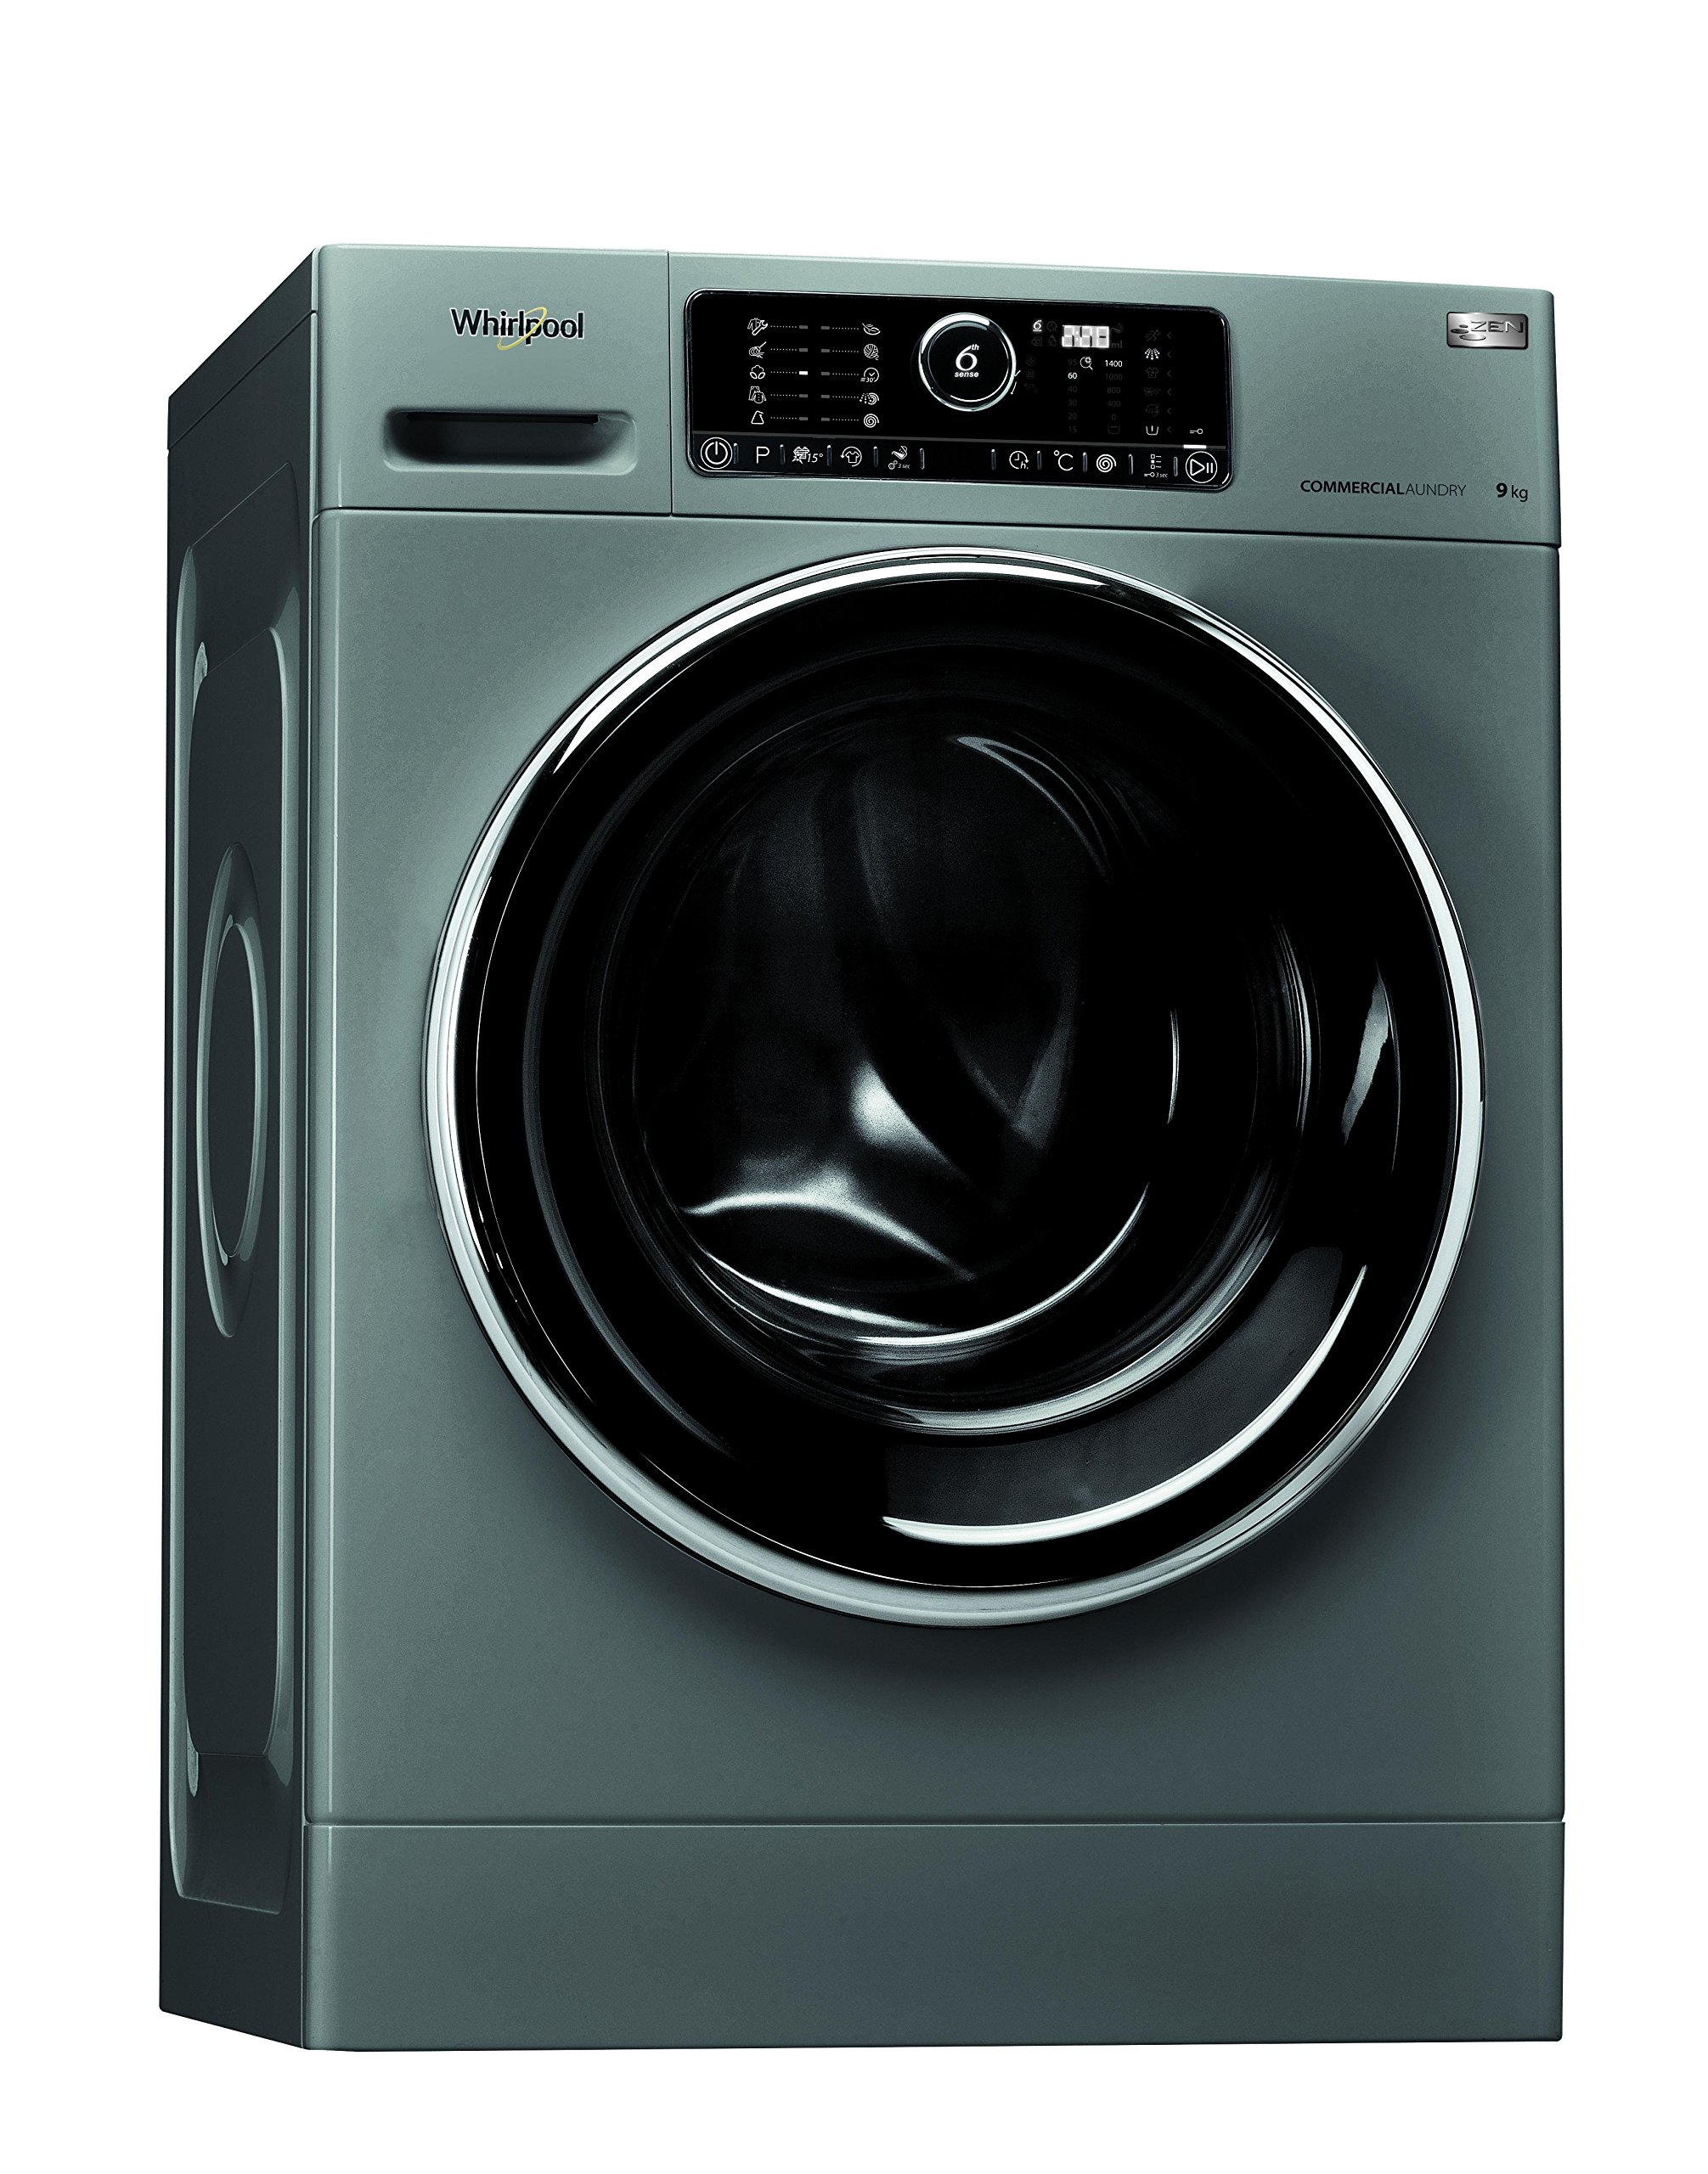 Whirlpool-AWG-912-SPro-autonome-Belastung-Bevor-9-kg-1200trmin-schwarz-grau-Waschmaschine-Waschmaschinen-autonome-bevor-Belastung-schwarz-grau-Oberflche-Schwarz-Edelstahl